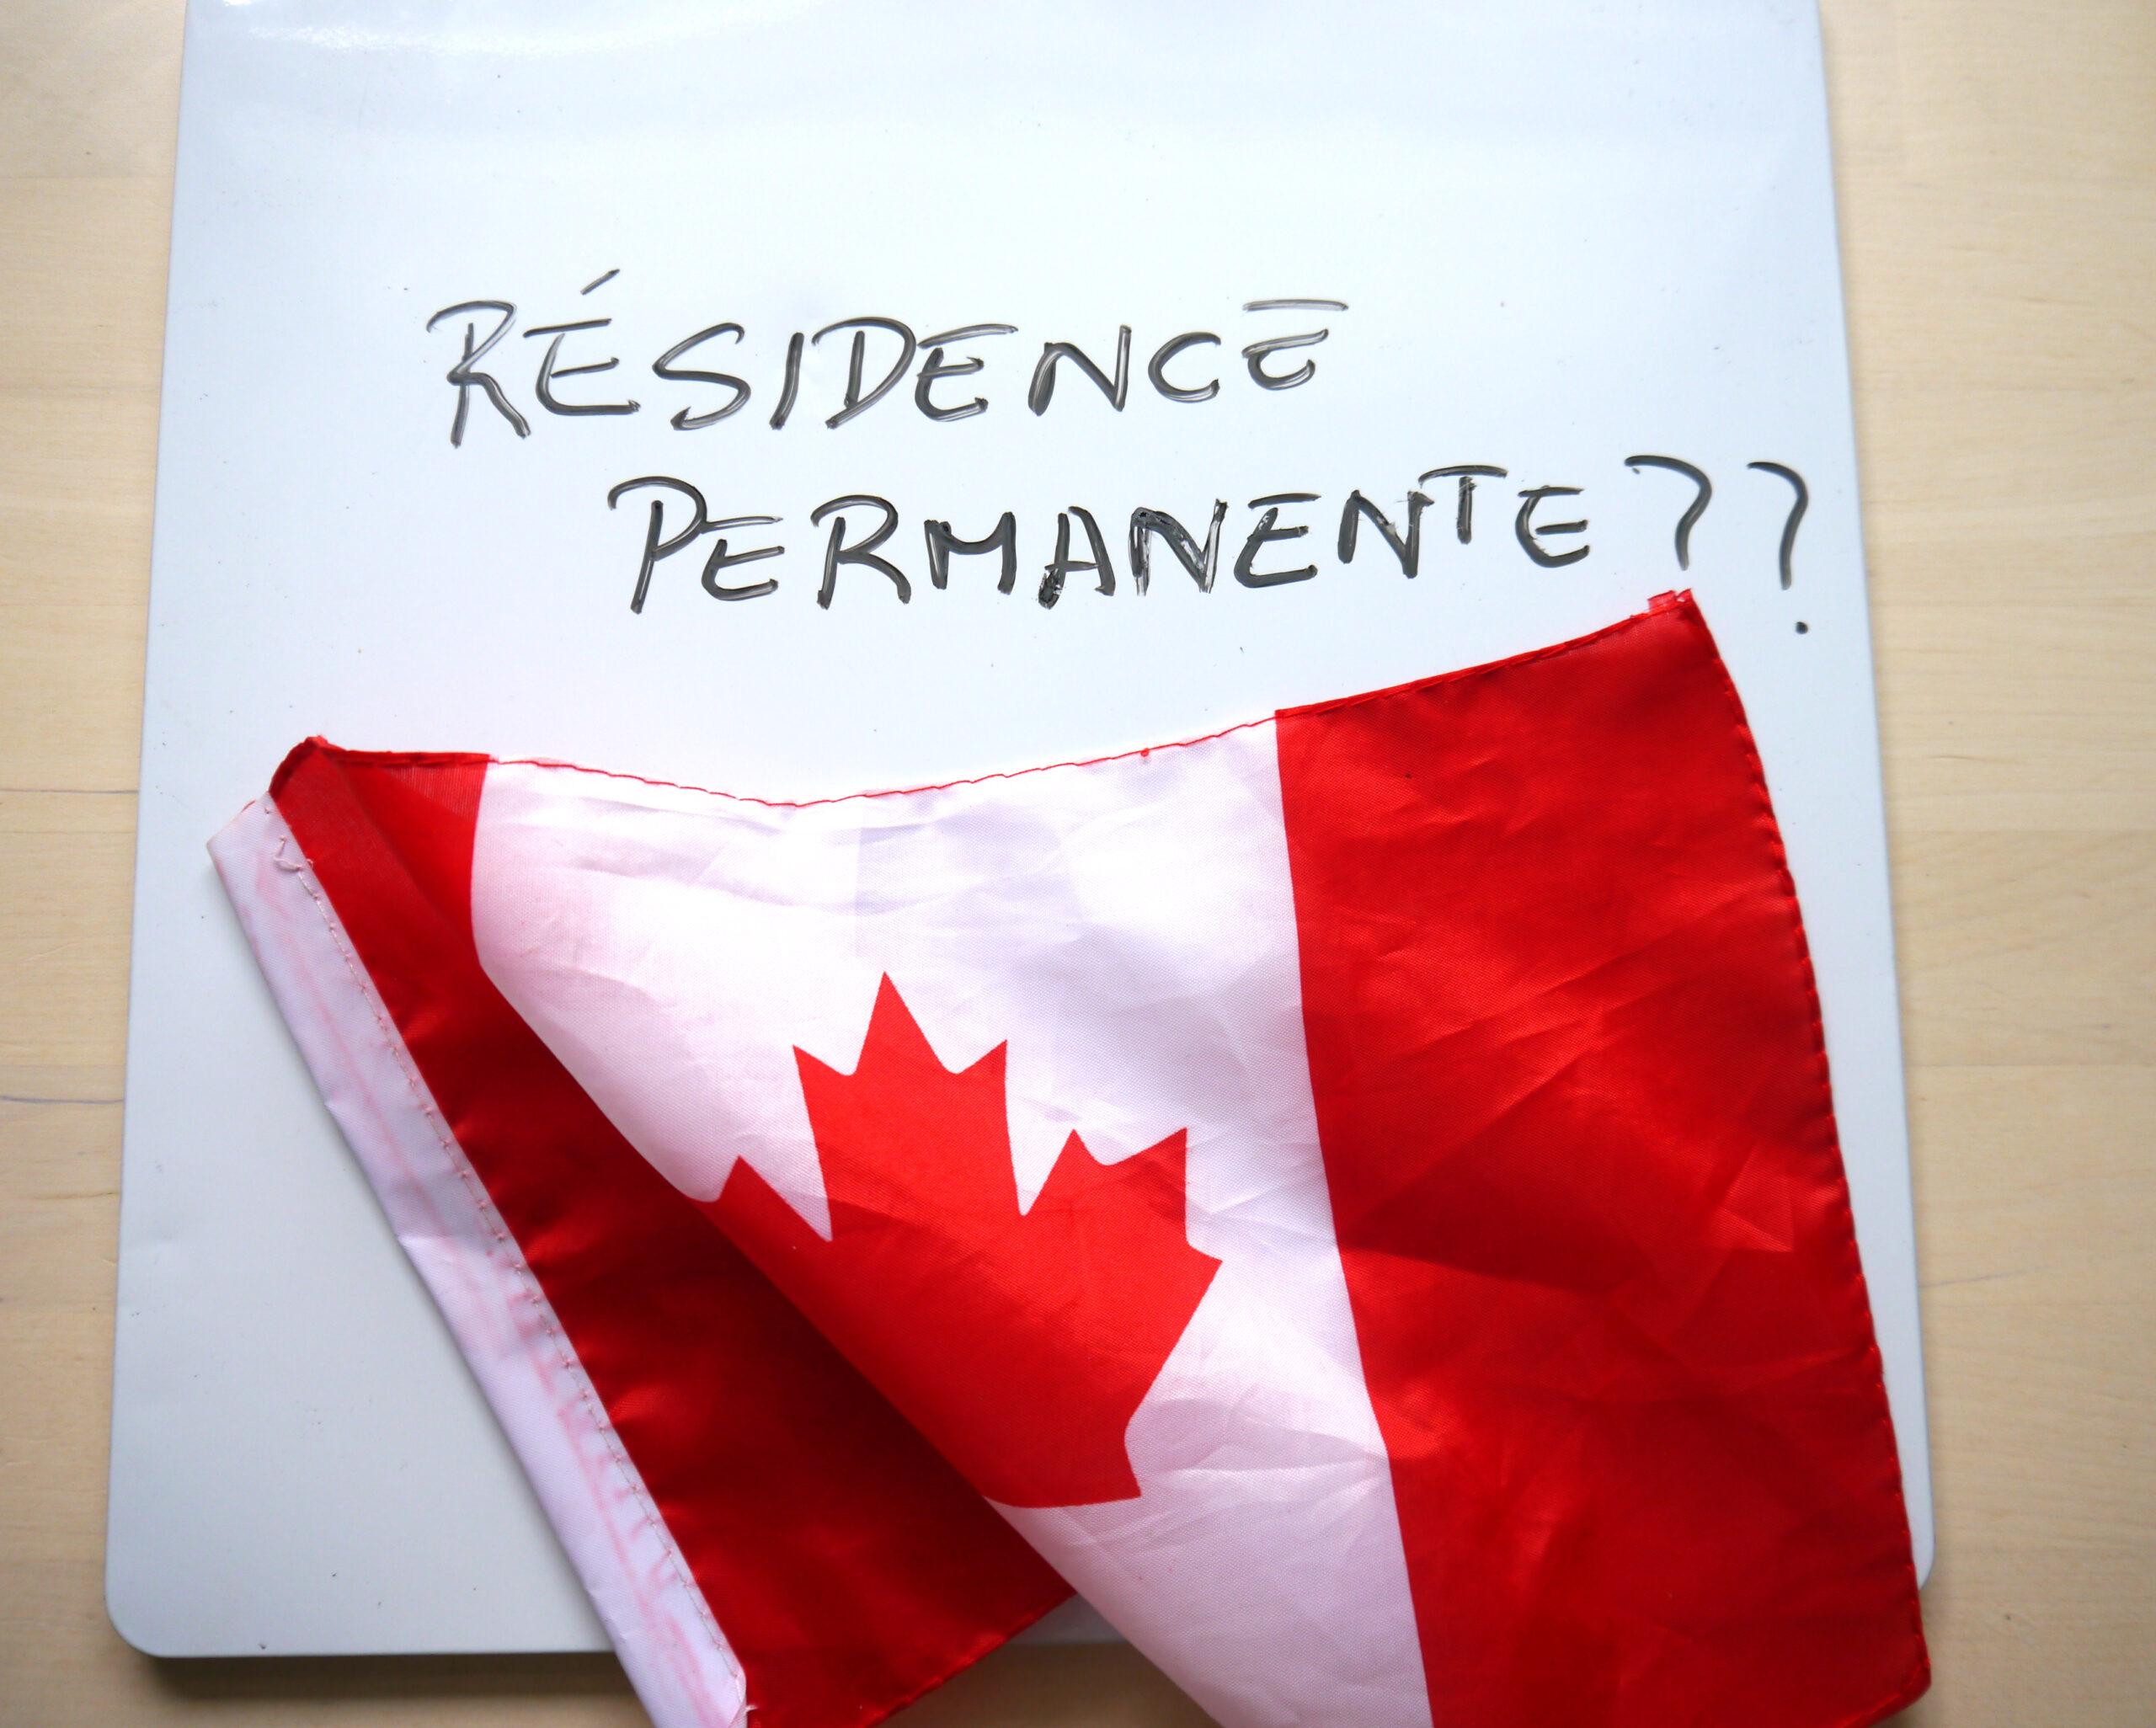 Résidence permanente